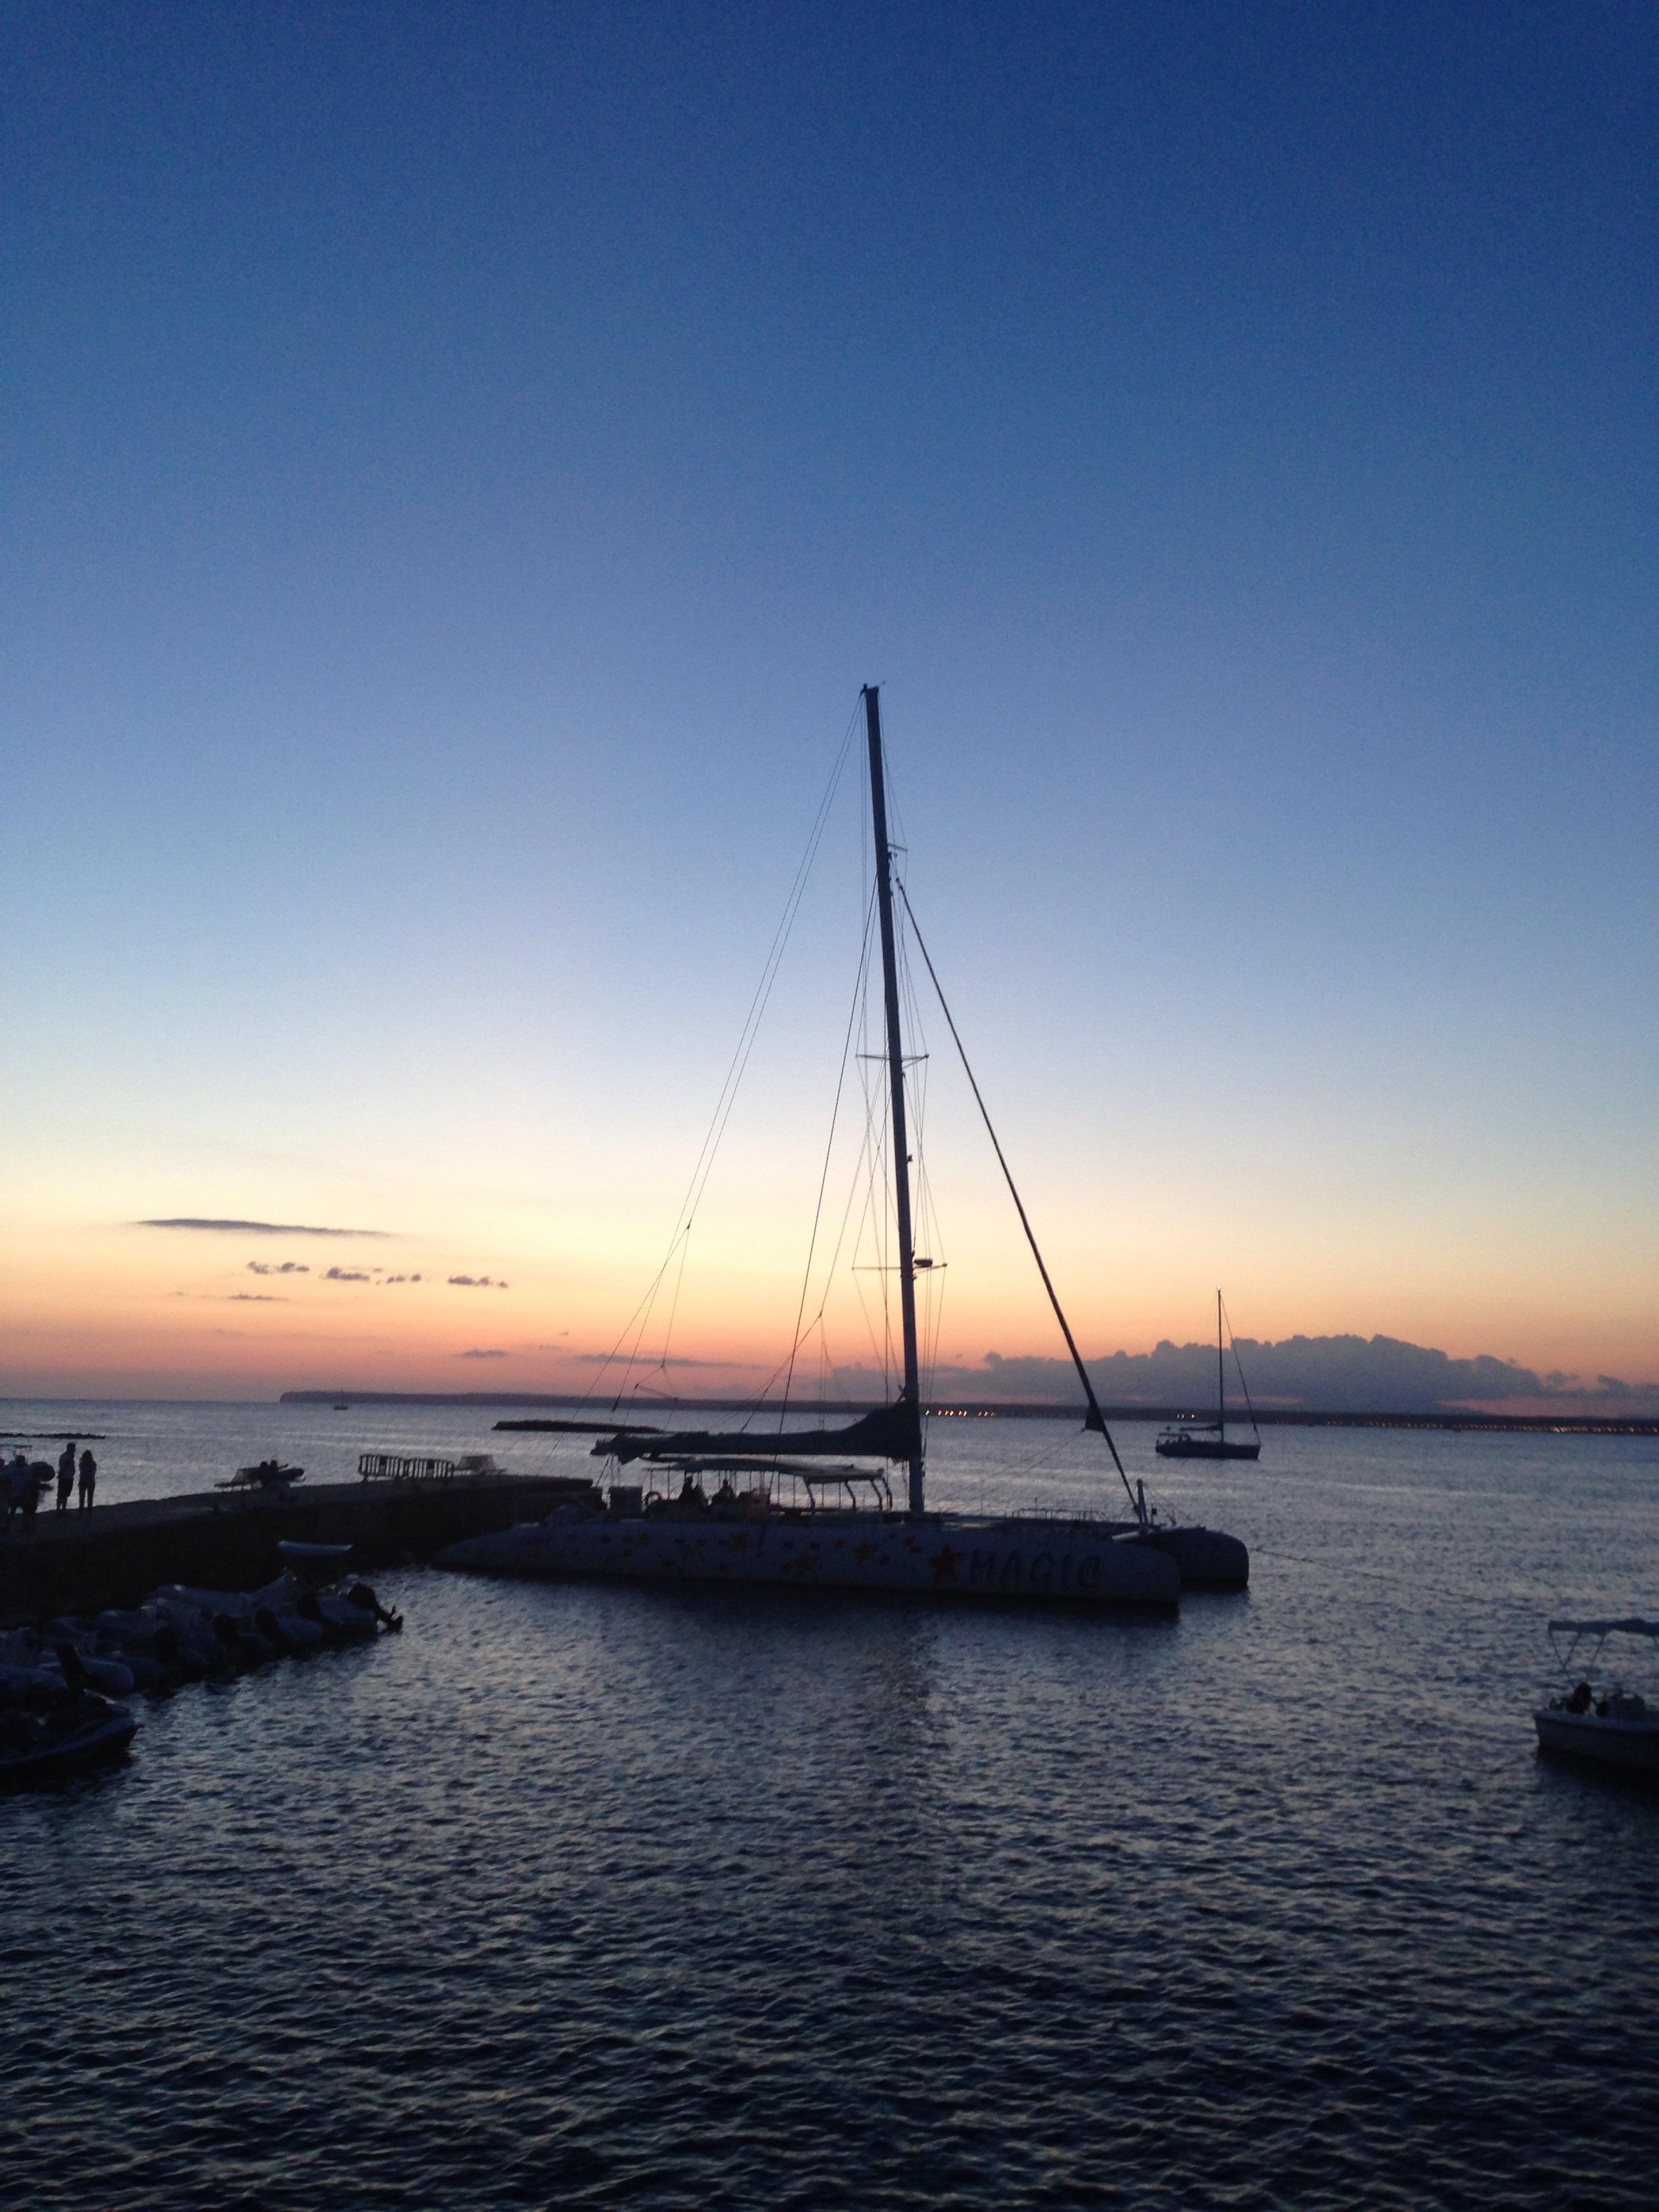 Segelschiffe auf dem meer sonnenuntergang  Kostenlose foto : Meer, Küste, Ozean, Horizont, Dock ...